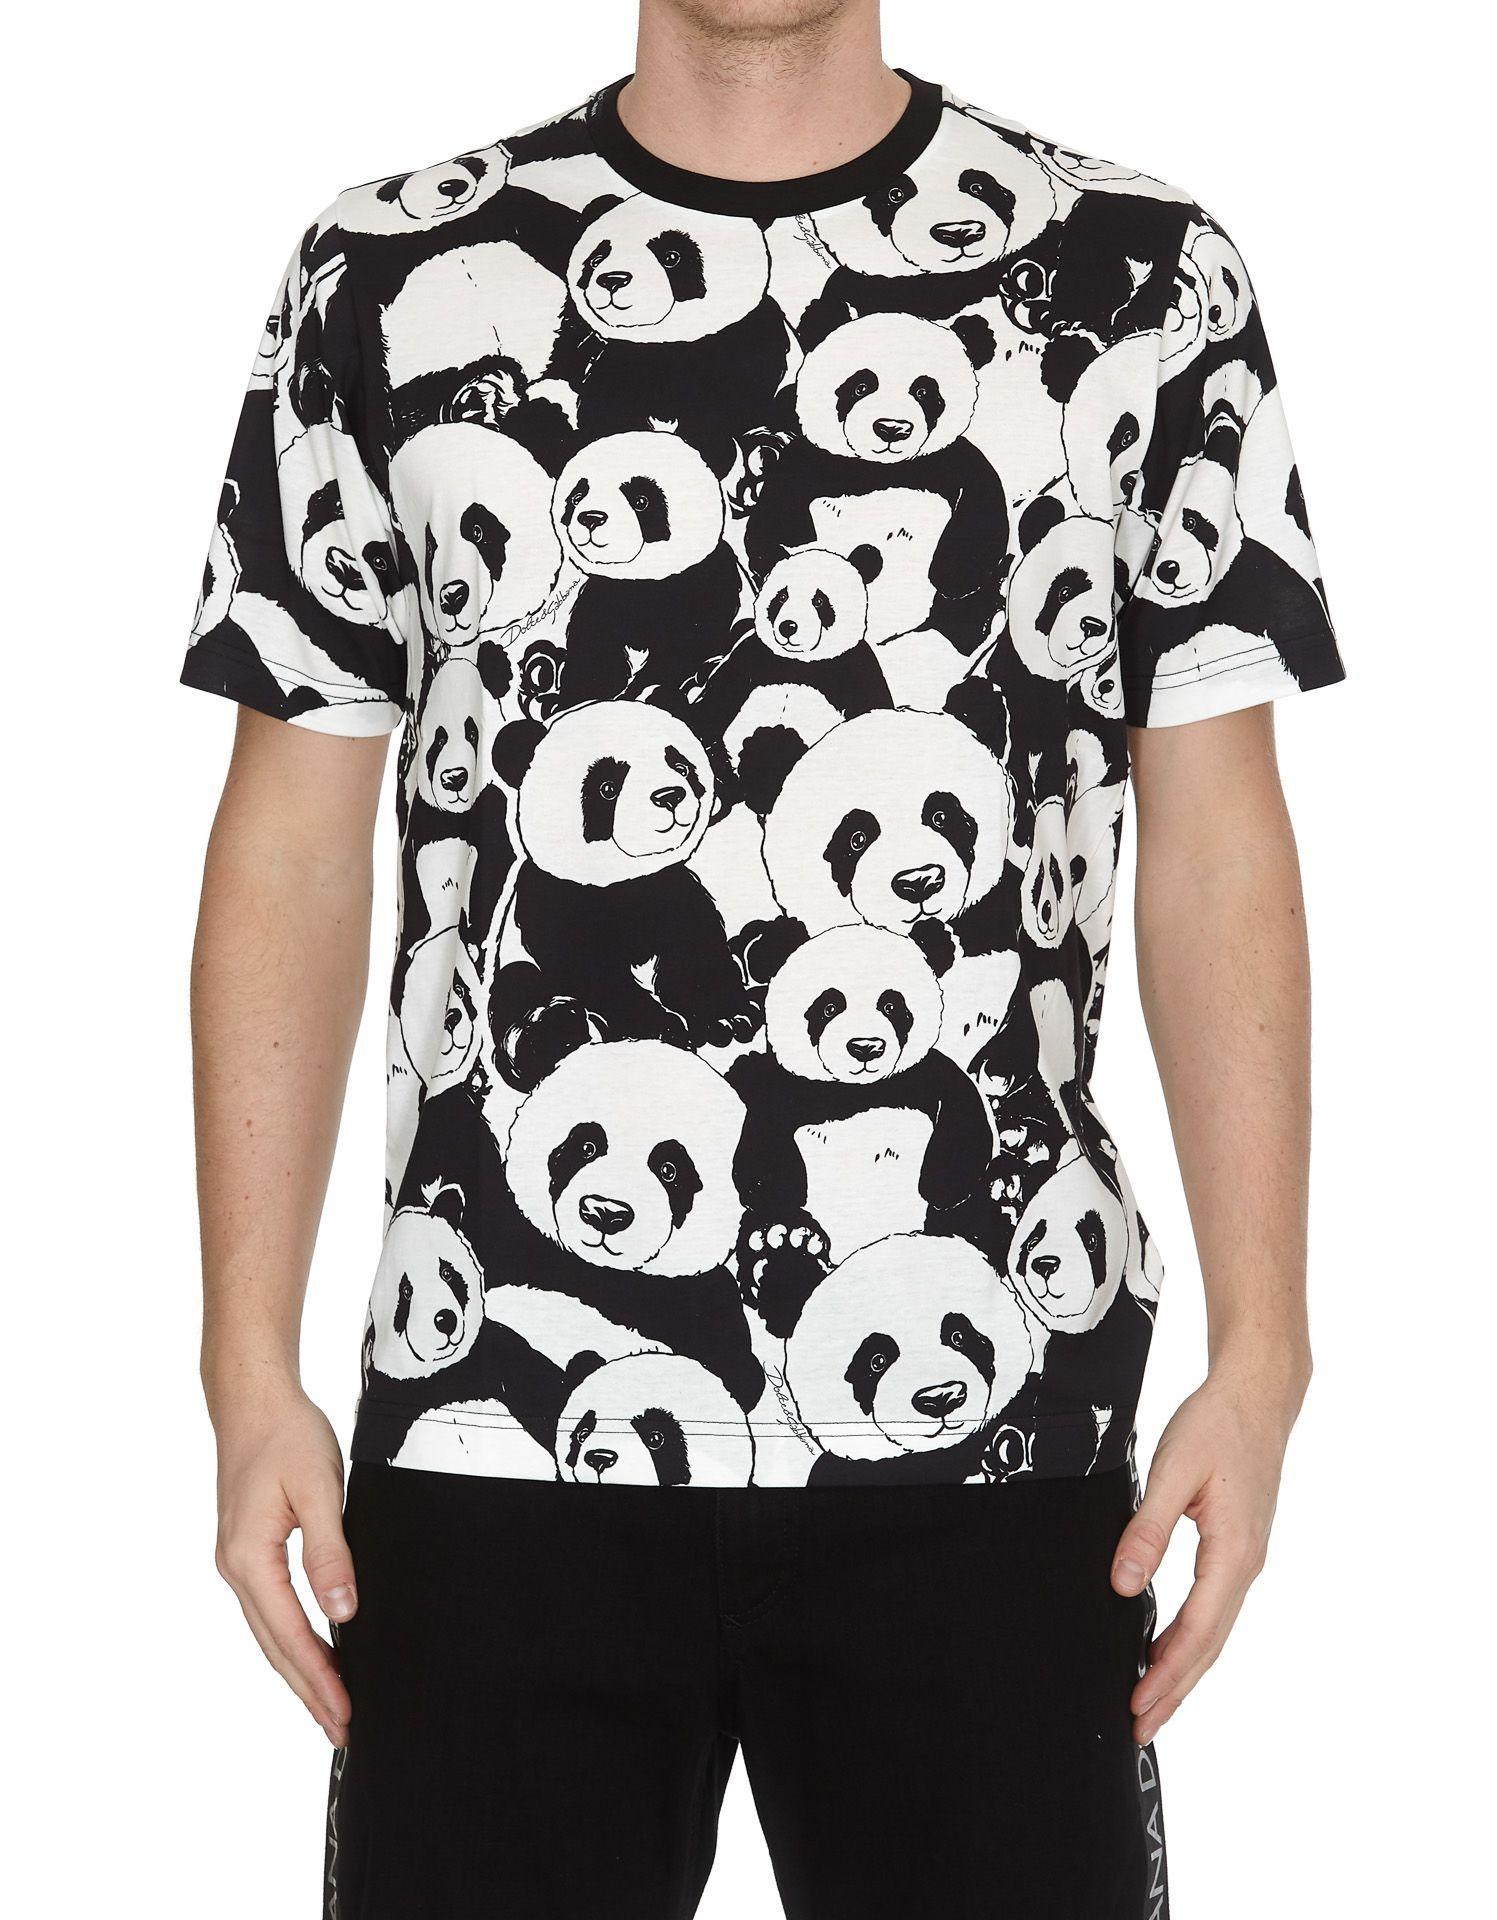 Dolce & Gabbana Panda Print T shirt In Hav86 Panda Fdo Panna